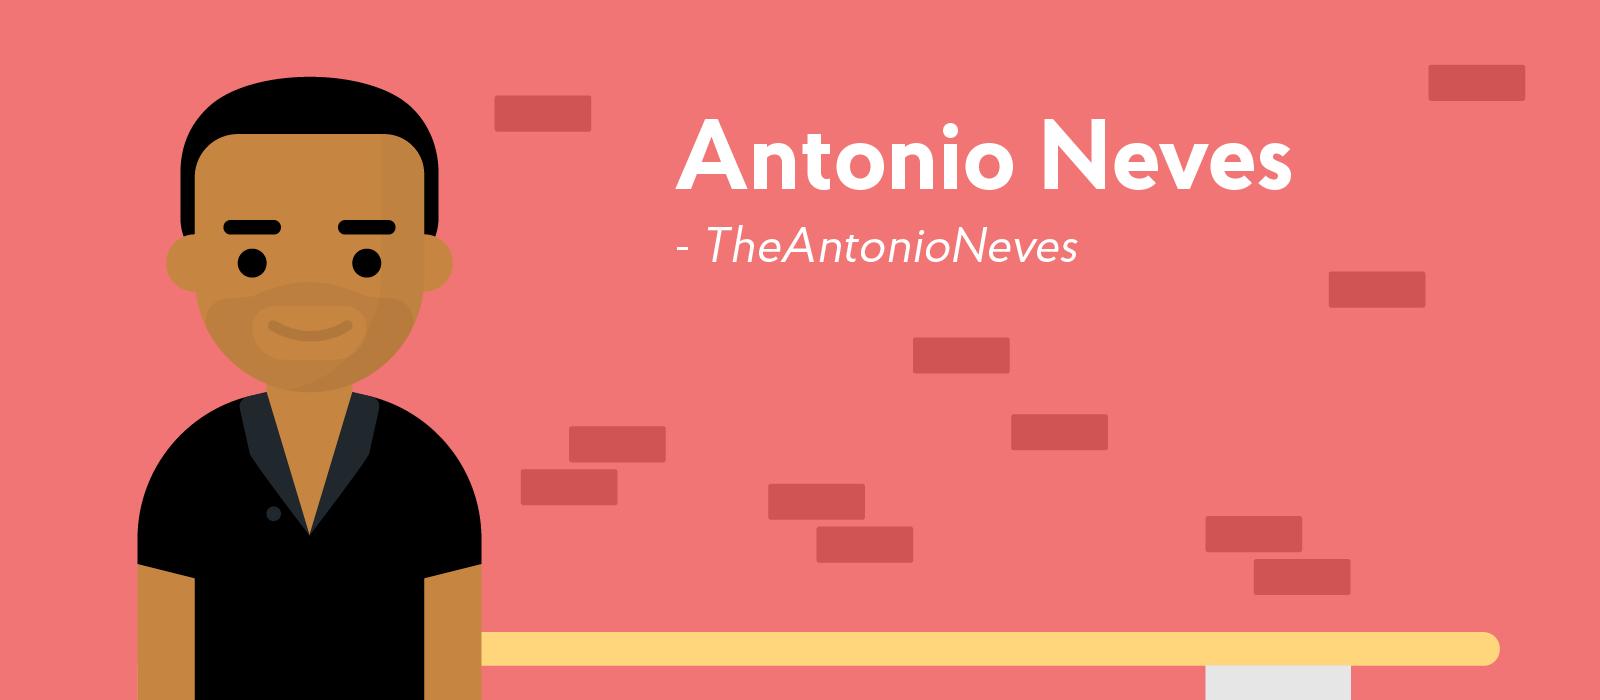 Antonio Neves career influencer